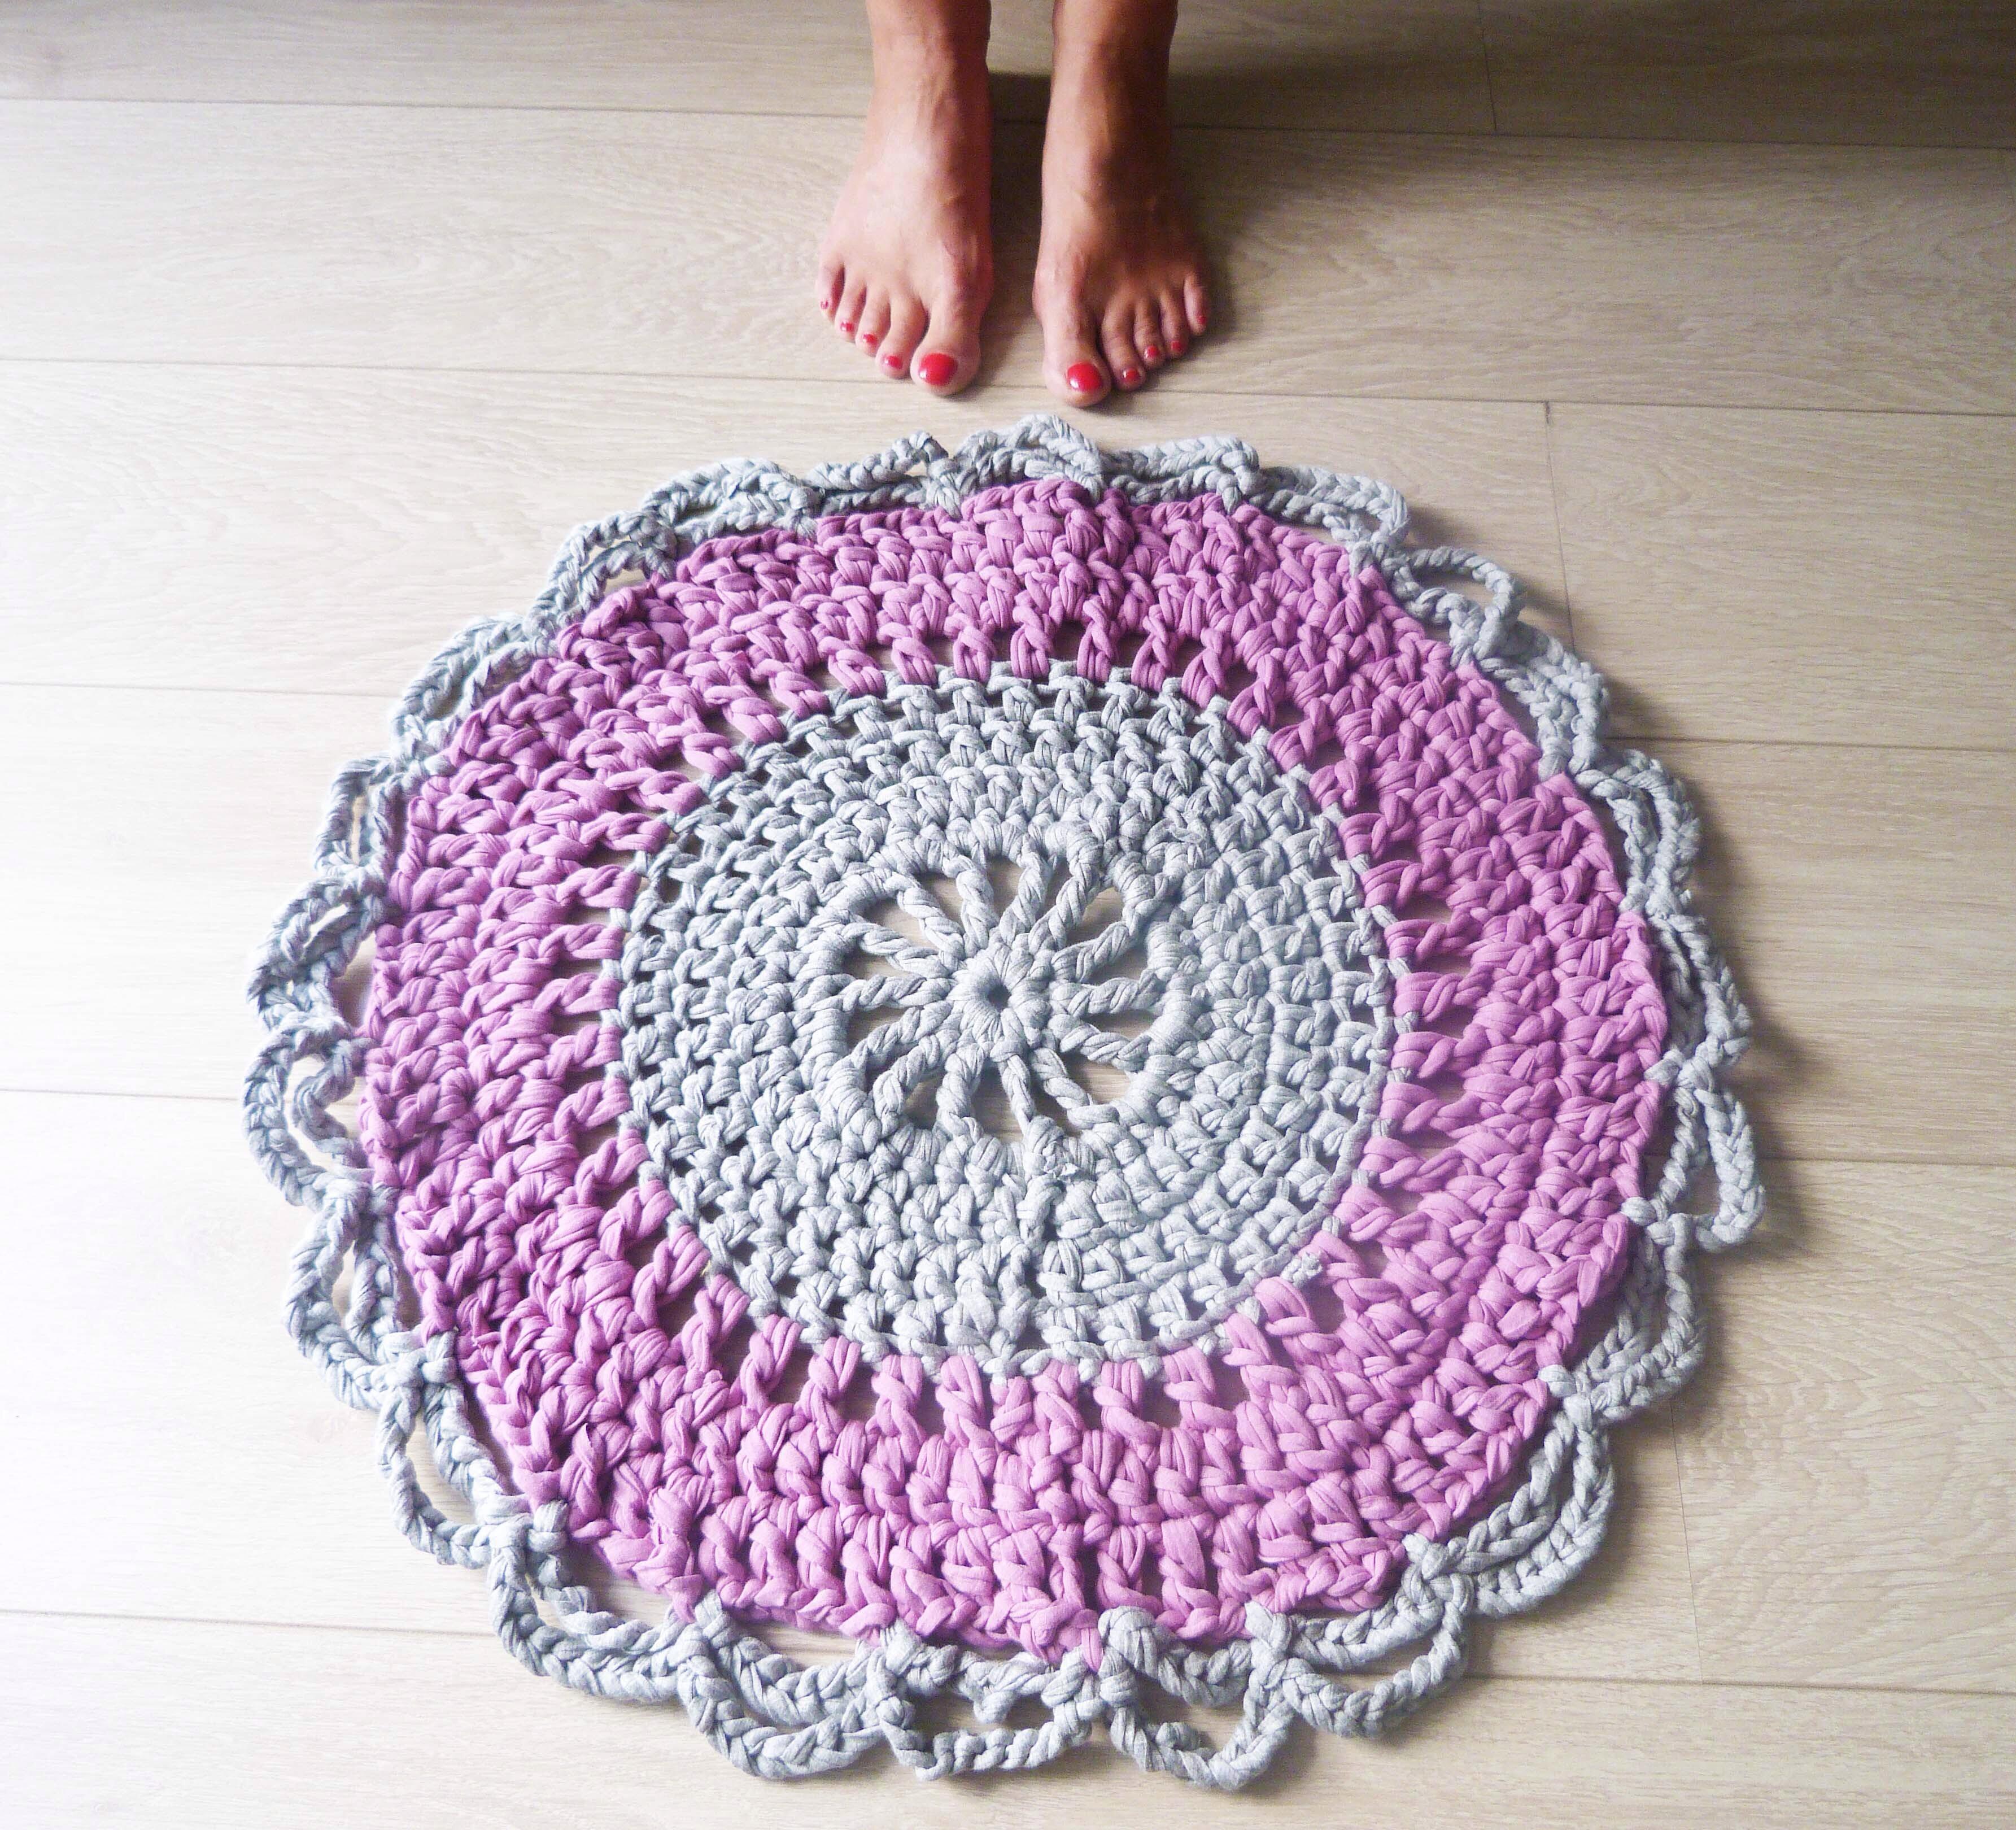 ¿Queréis hacer una alfombra de trapillo?